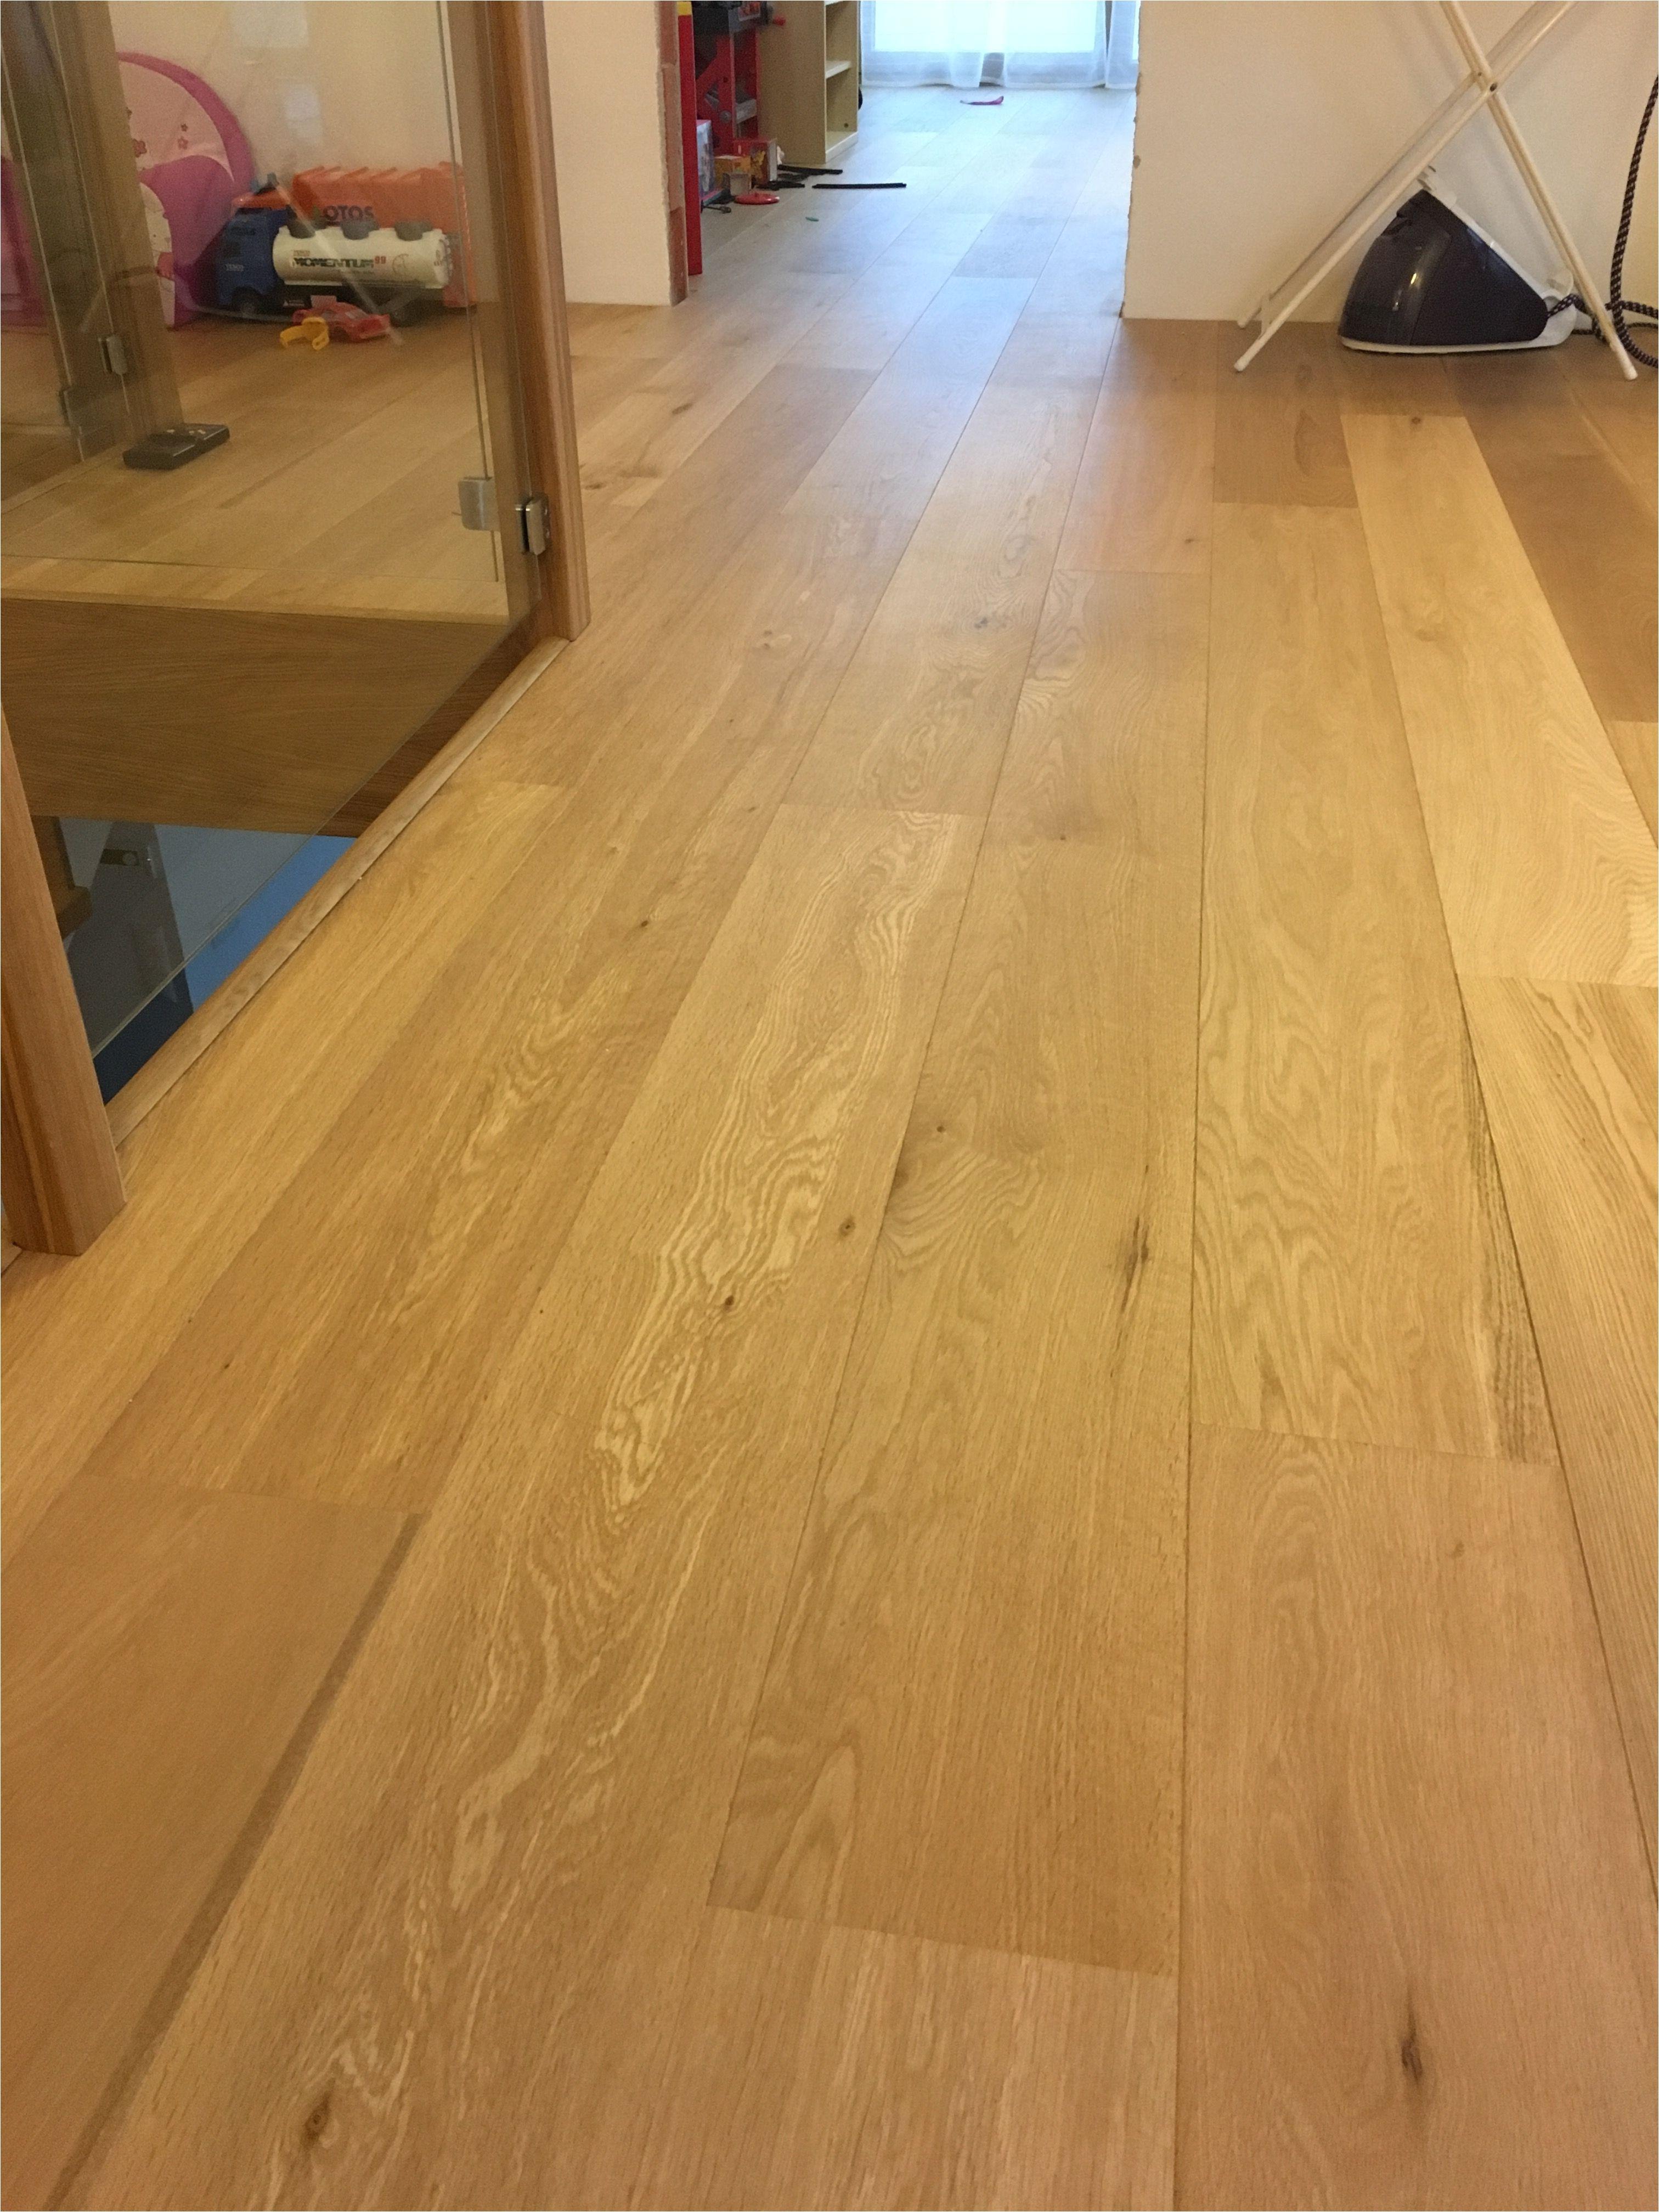 naturalny dub od belgickeho va robcu lamett inspiration of waterproof coating for laminate flooring